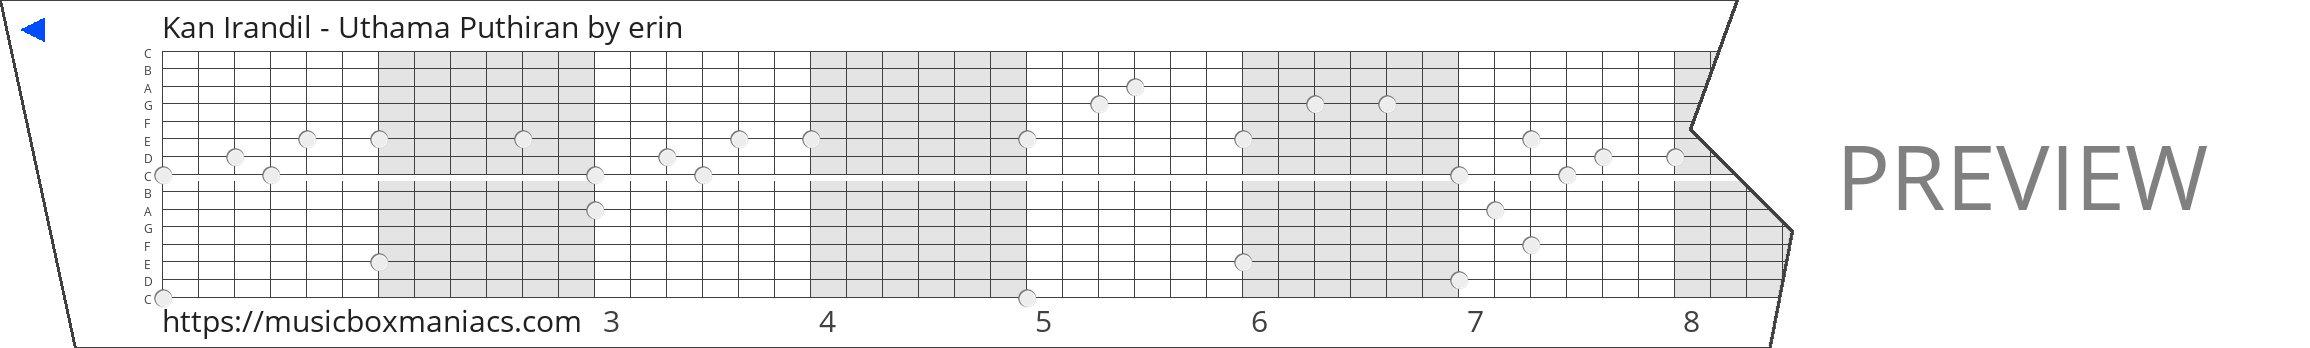 Kan Irandil - Uthama Puthiran 15 note music box paper strip